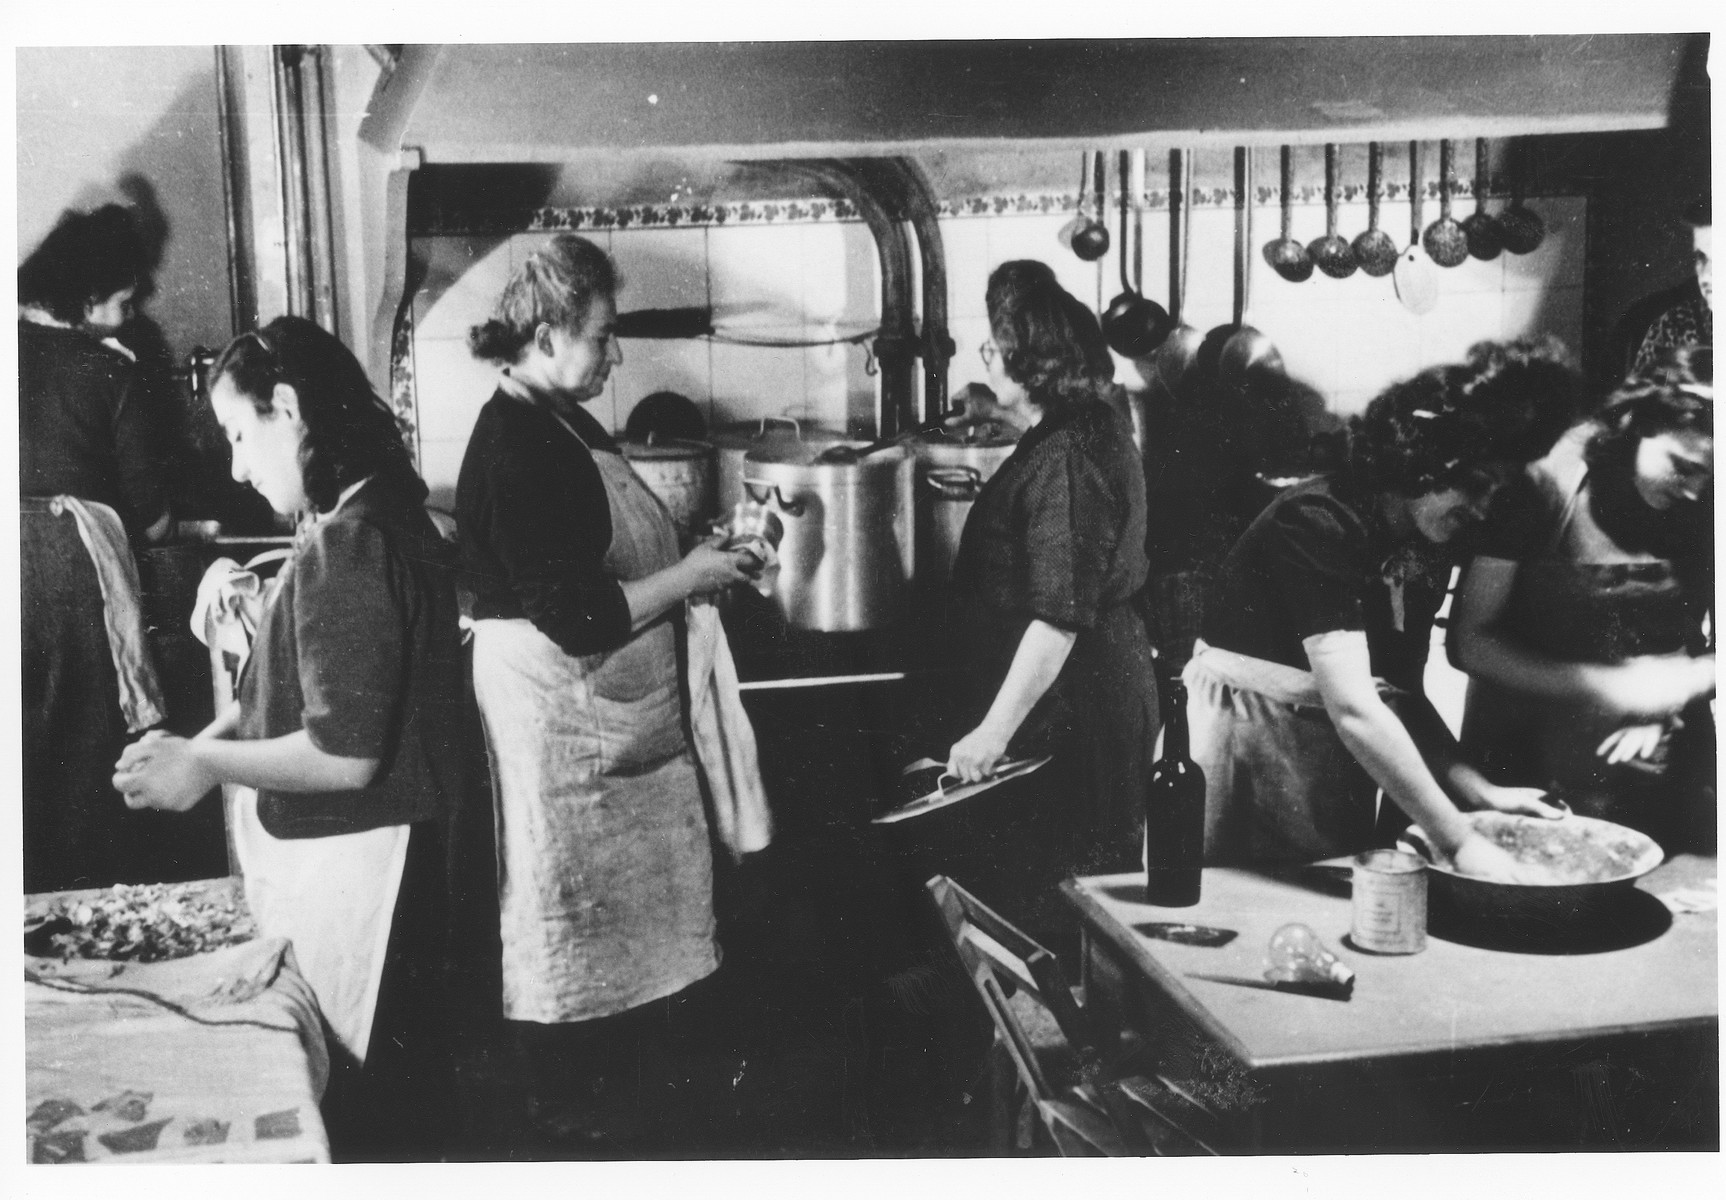 Women prepare food in the kitchen of the Saint Germain children's home.